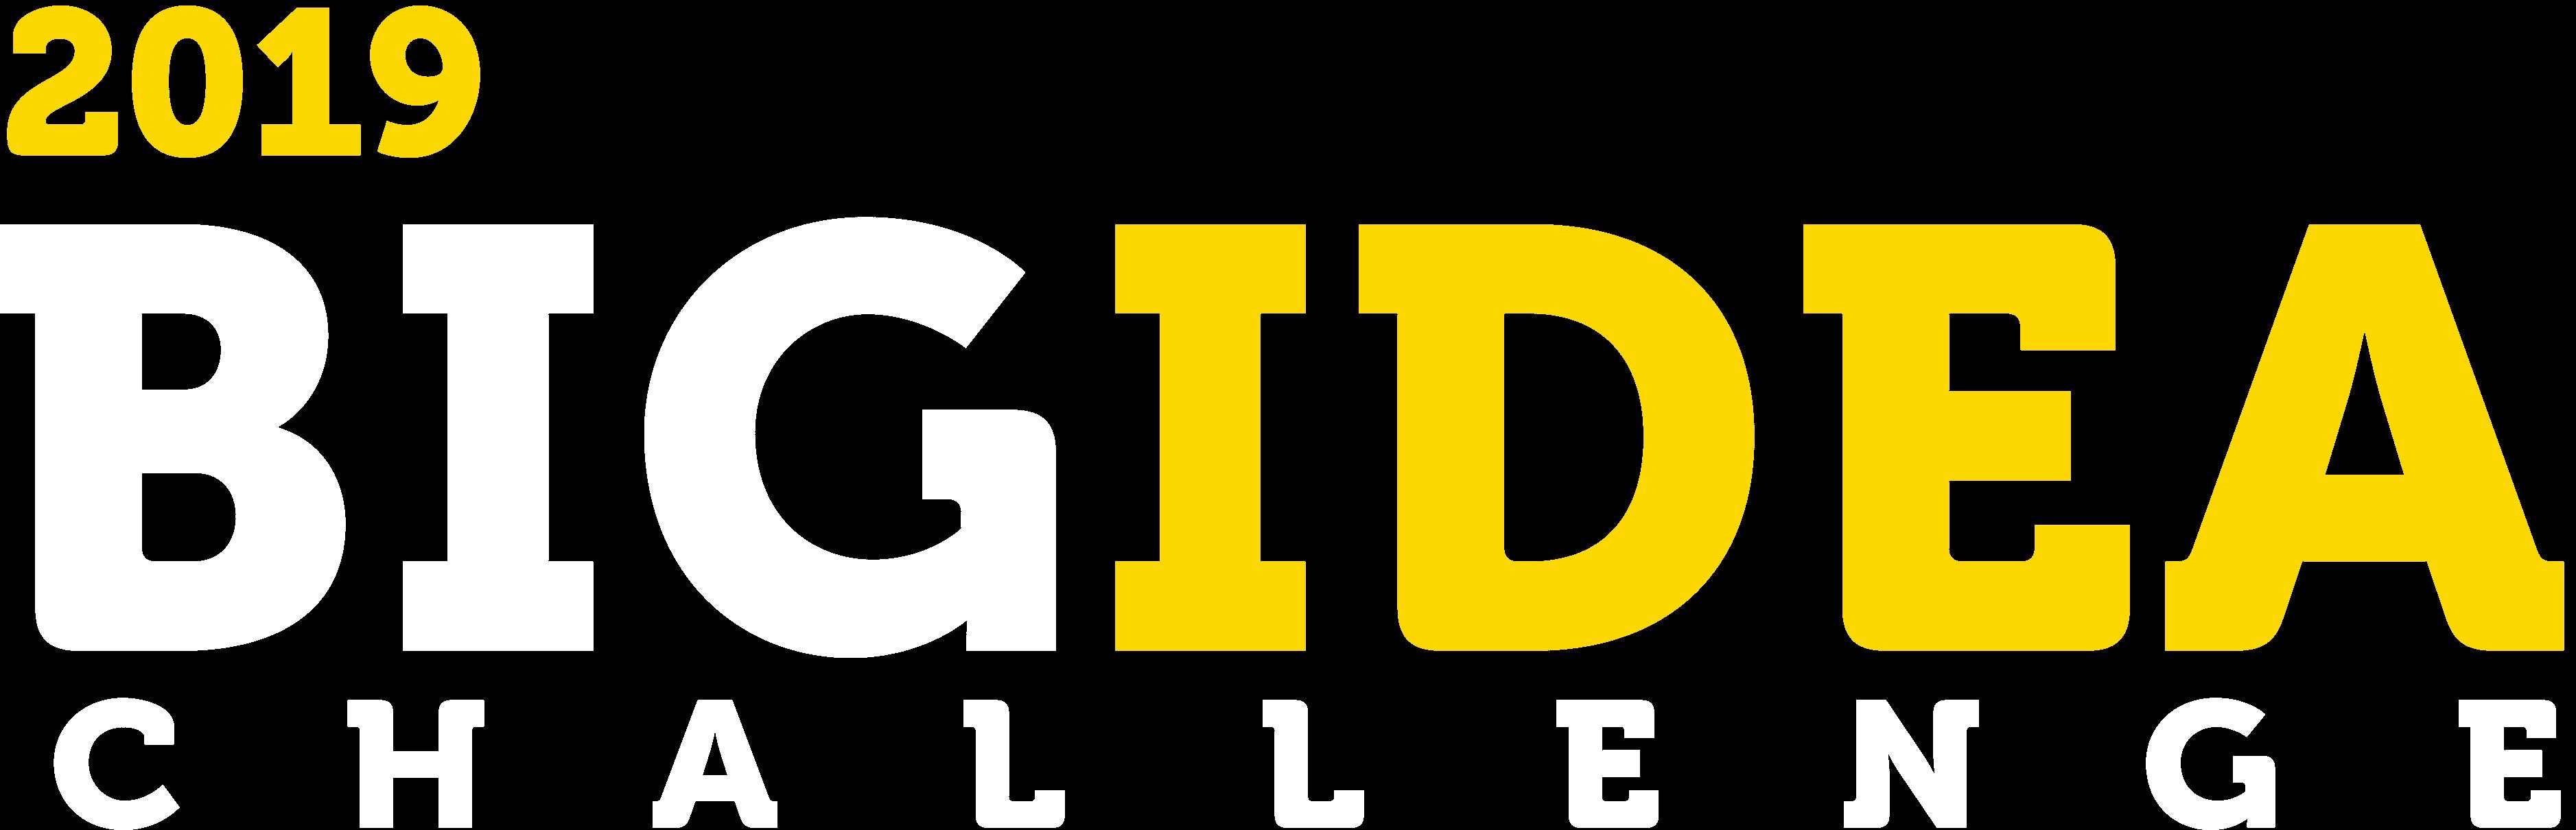 bic-2019-logo-yellow